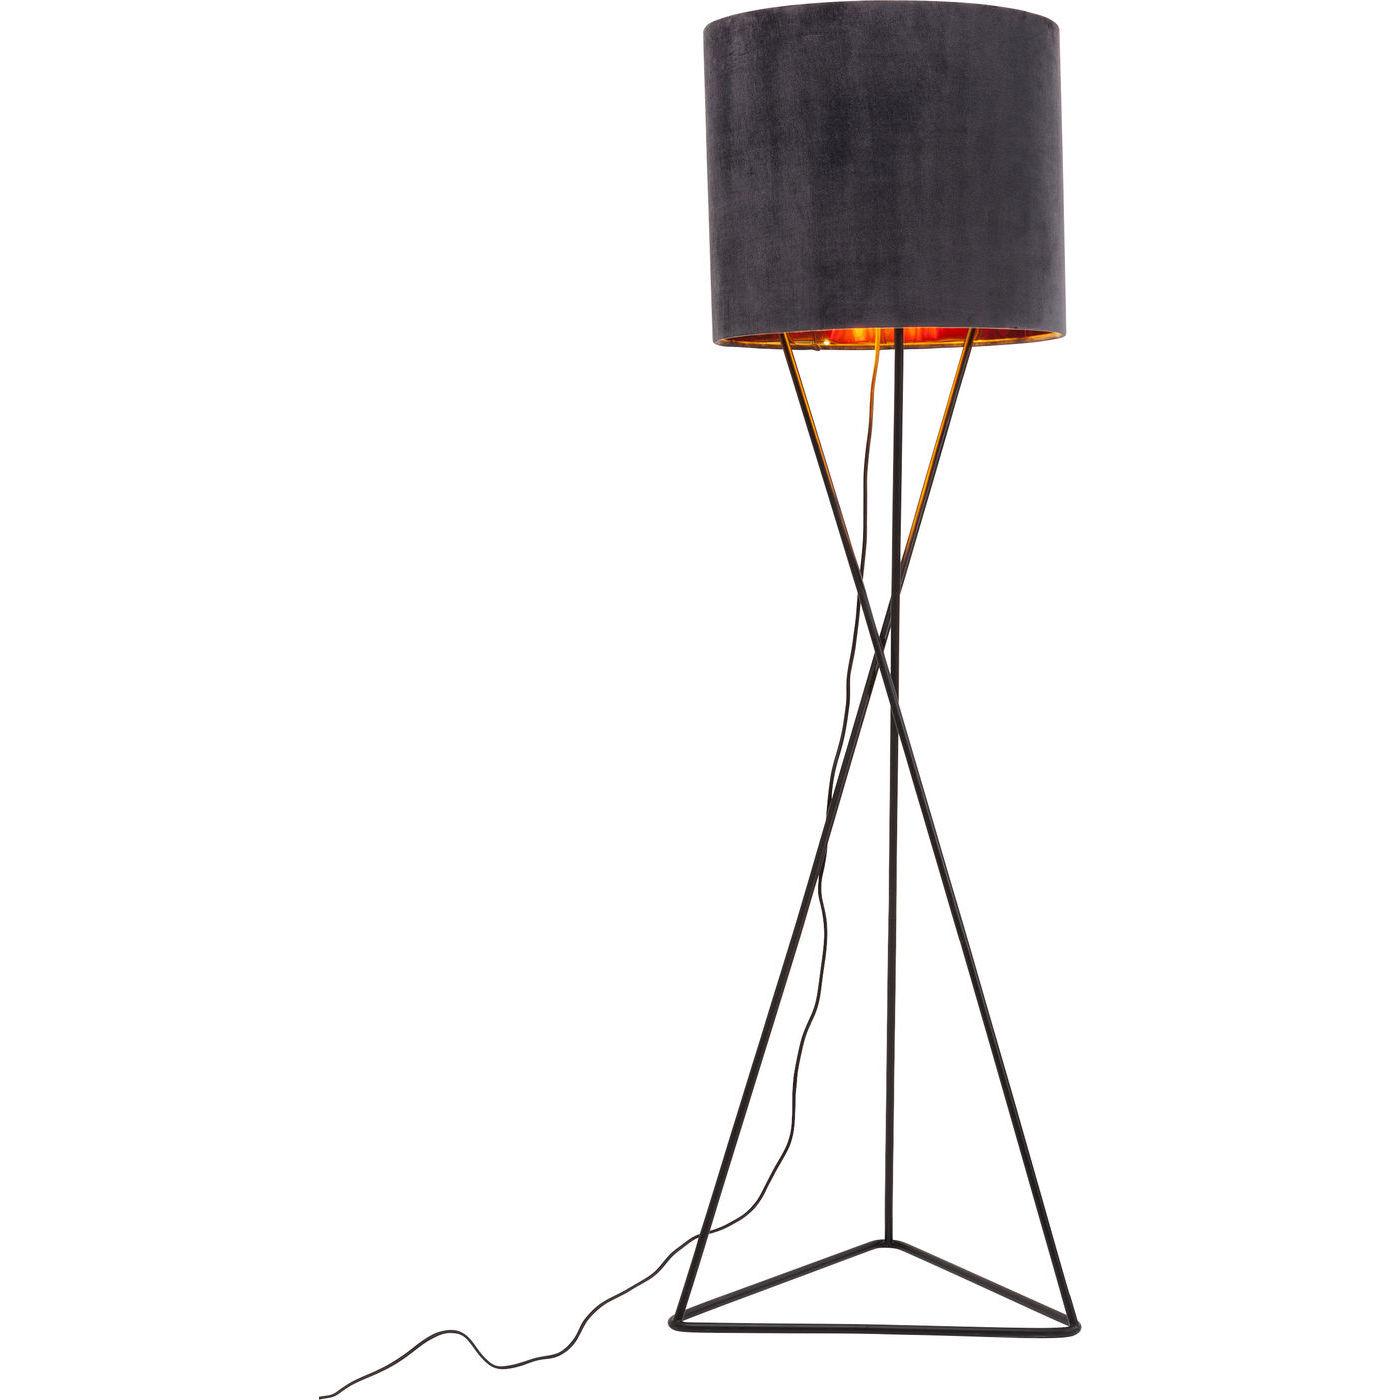 Image of   KARE DESIGN Triangle Night Sky gulvlampe - sort stof/sort stål